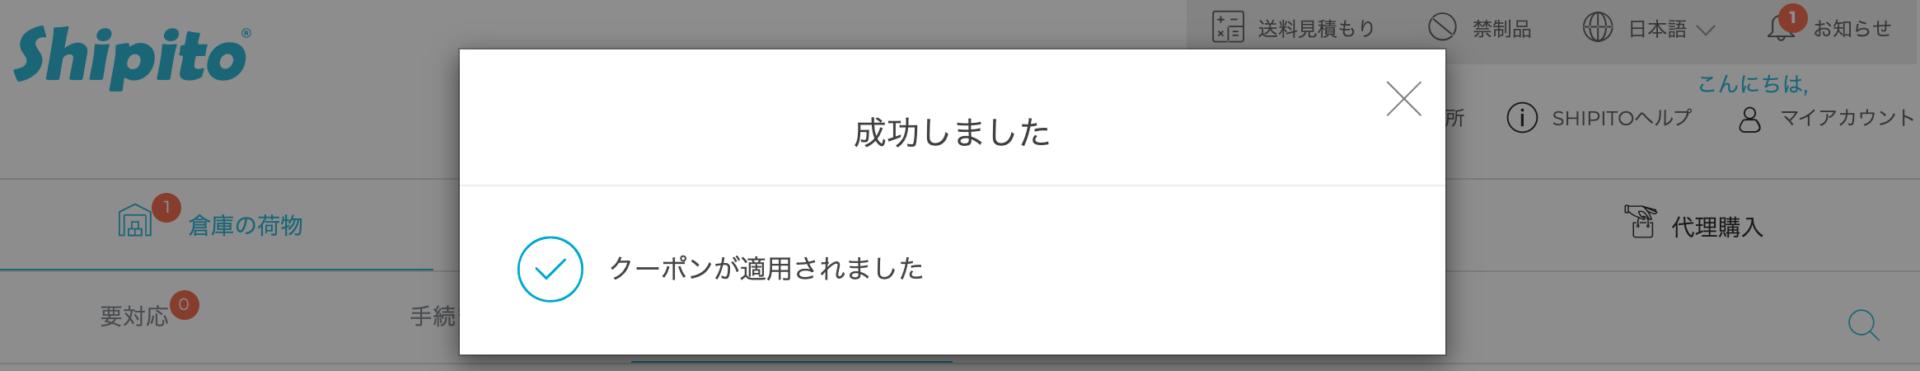 Shipito クーポンの適用